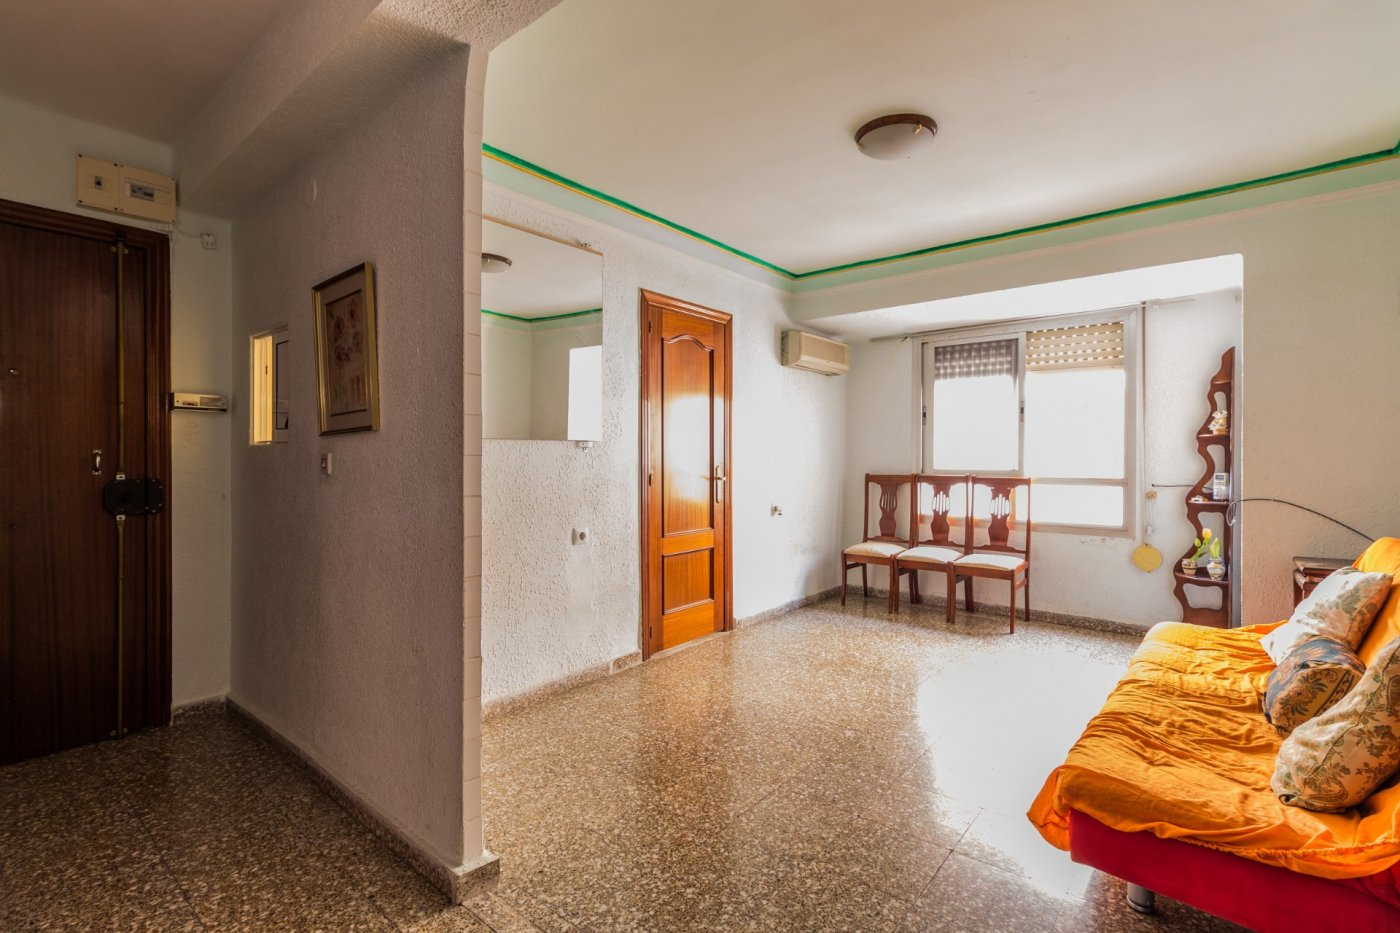 Appartement  Burjassot ,cantereria. Piso economico de cuatro dormitorios